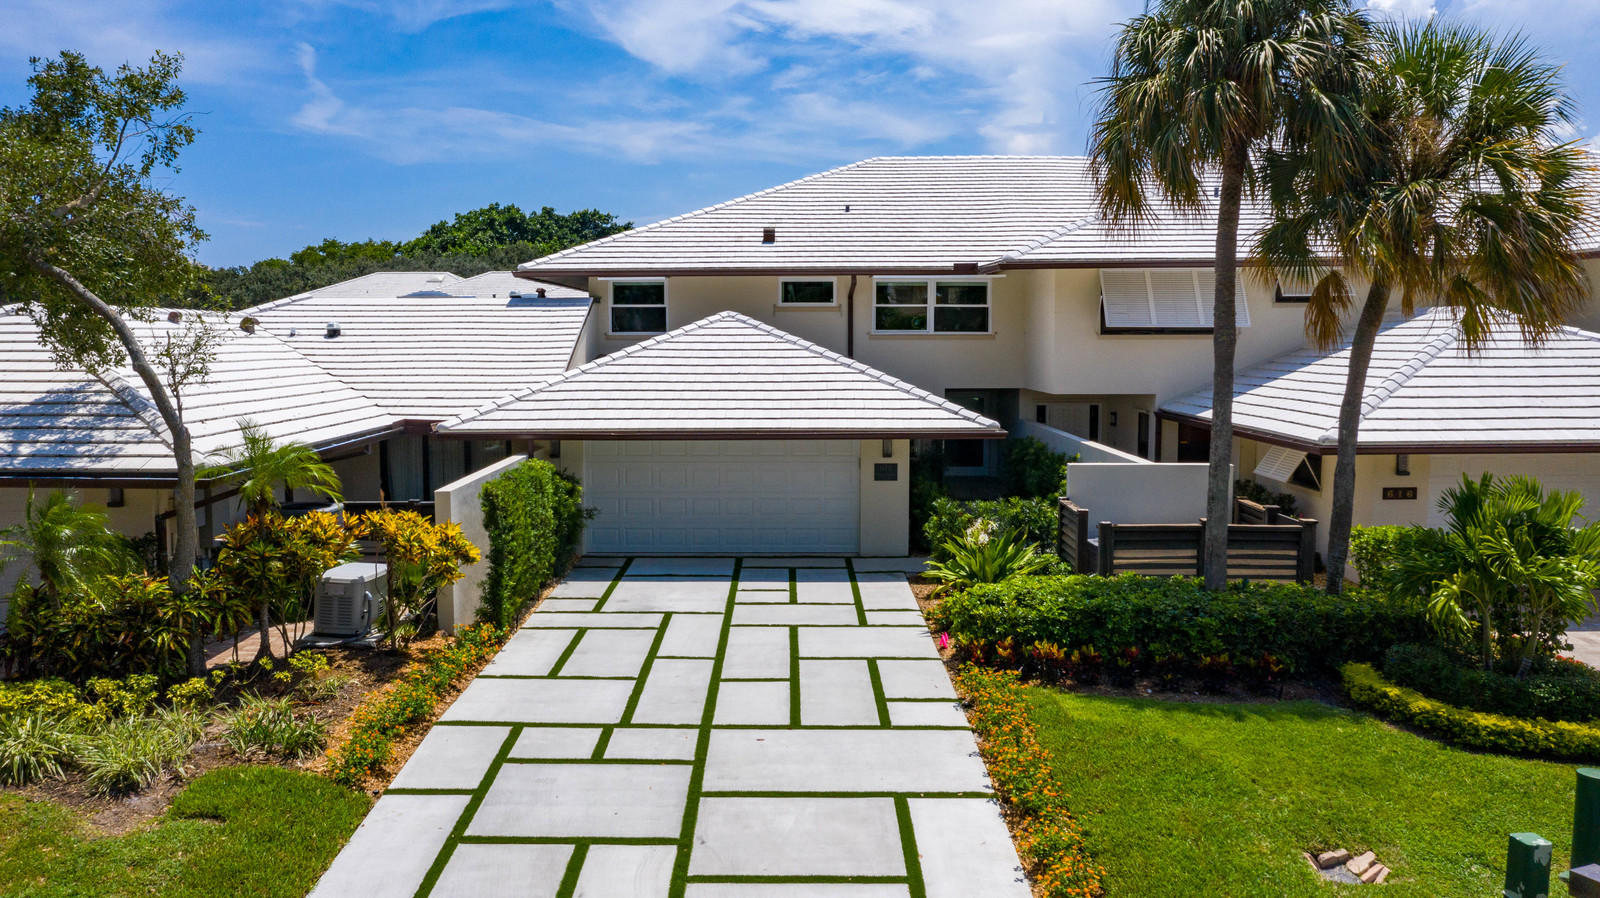 618 Boca Marina Court  Boca Raton, FL 33487